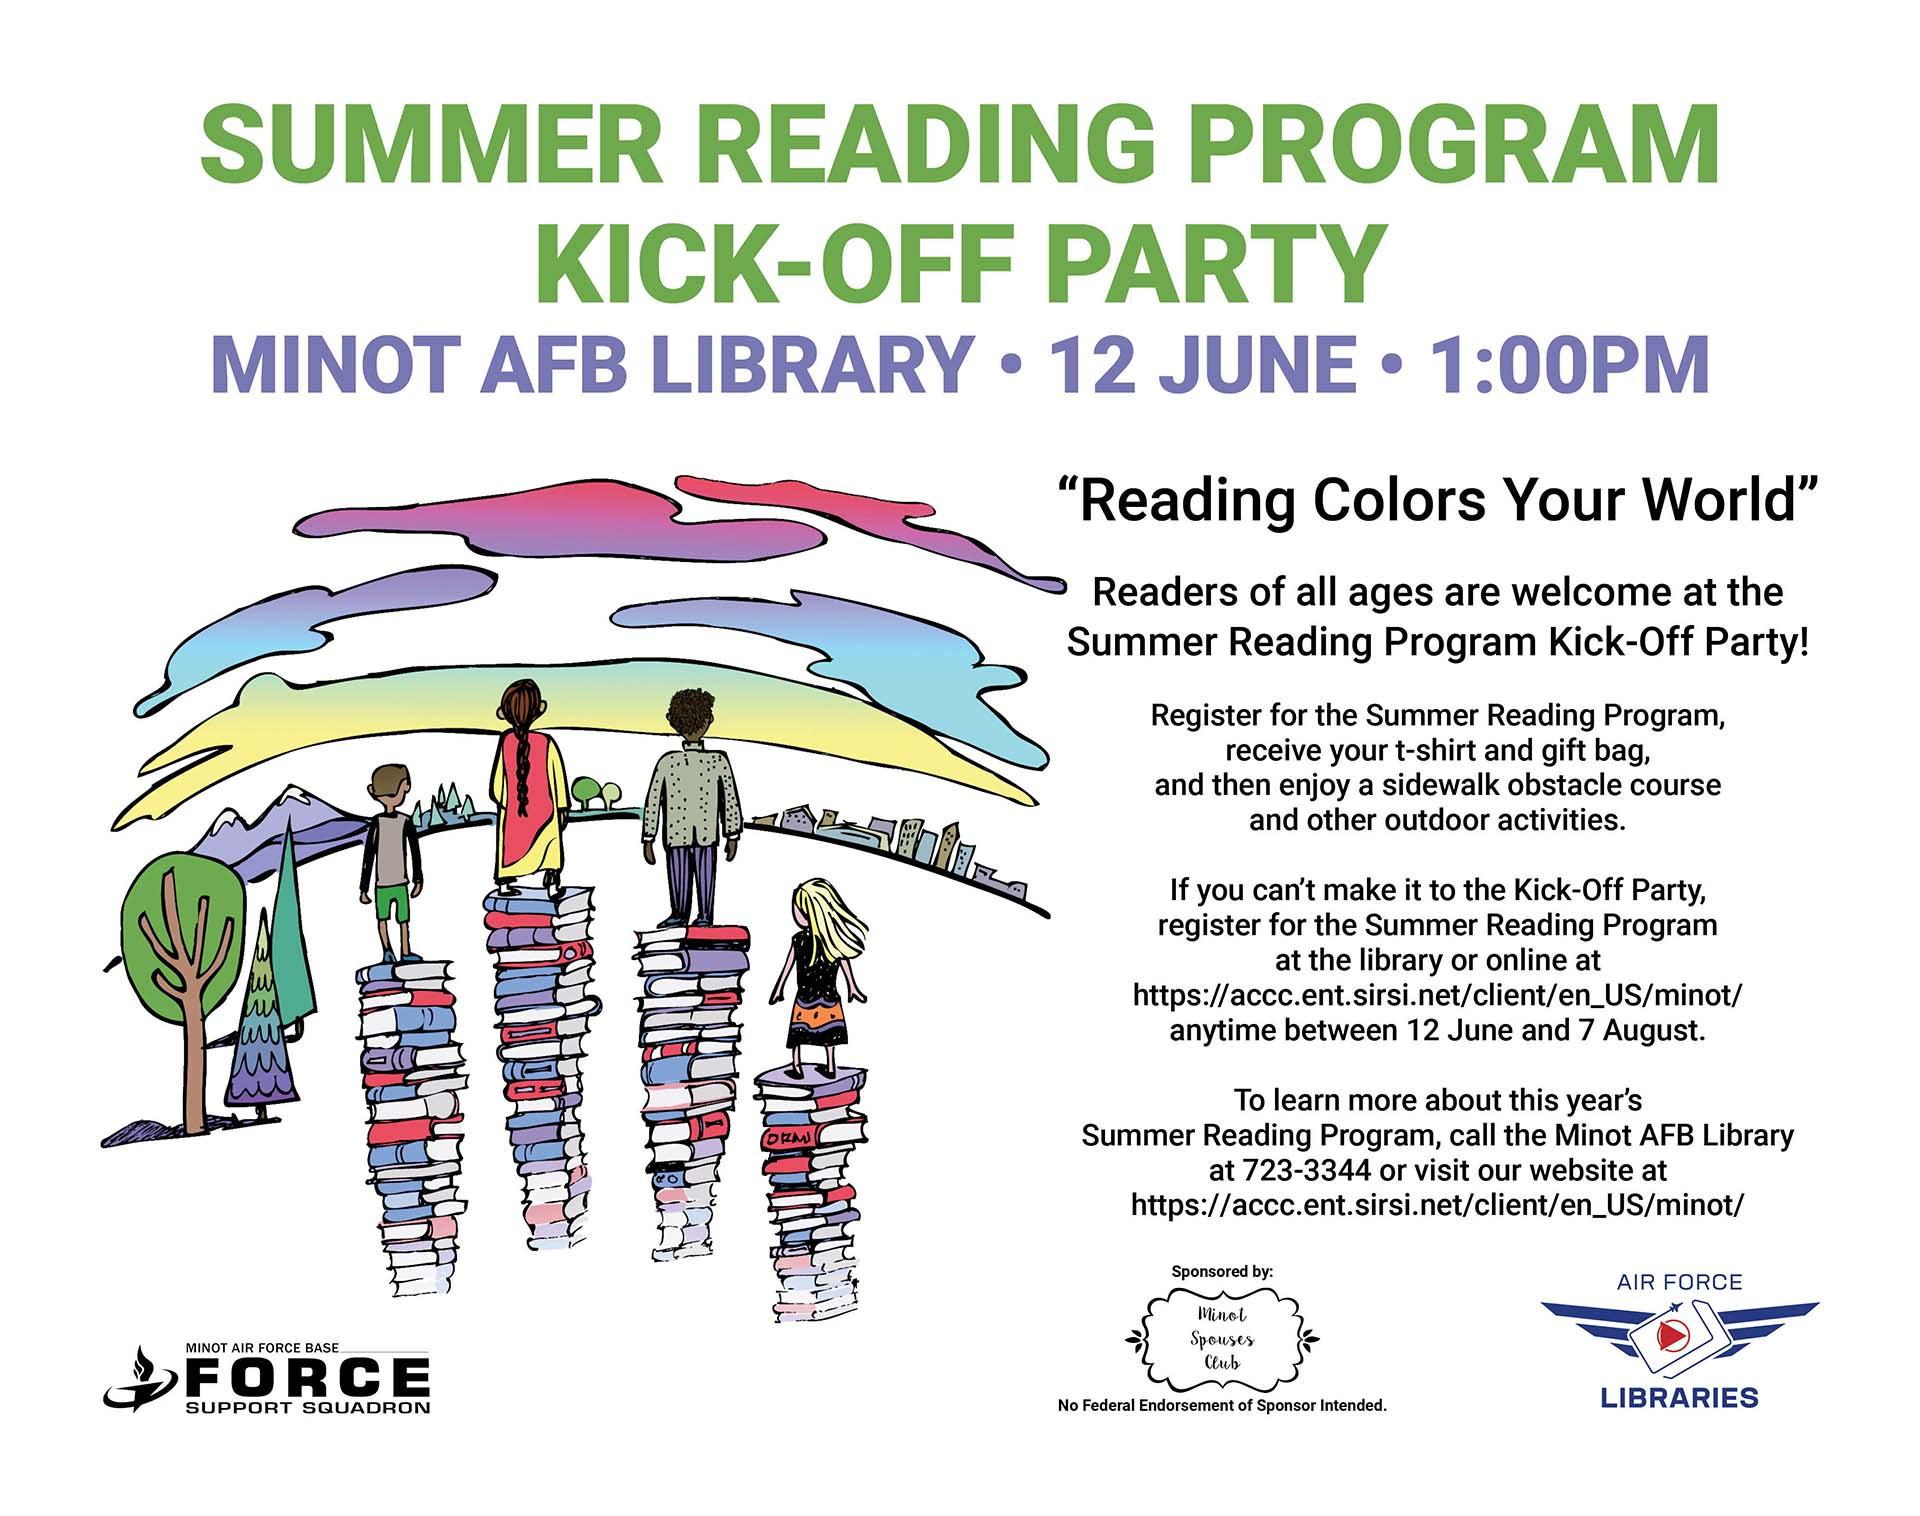 Summer Reading Program Kick-Off Party